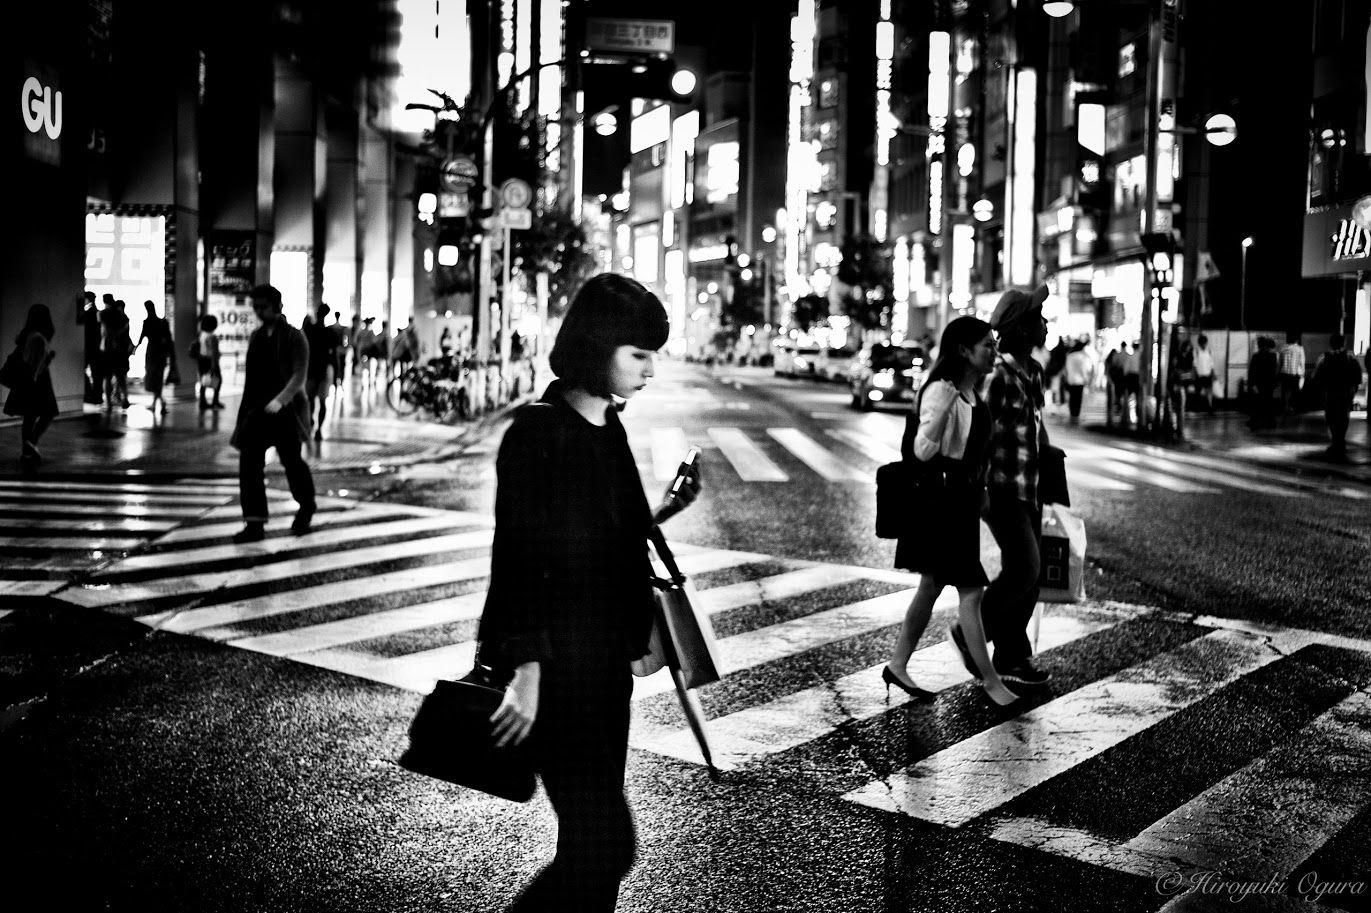 Hiroyuki Ogura photography 3-1